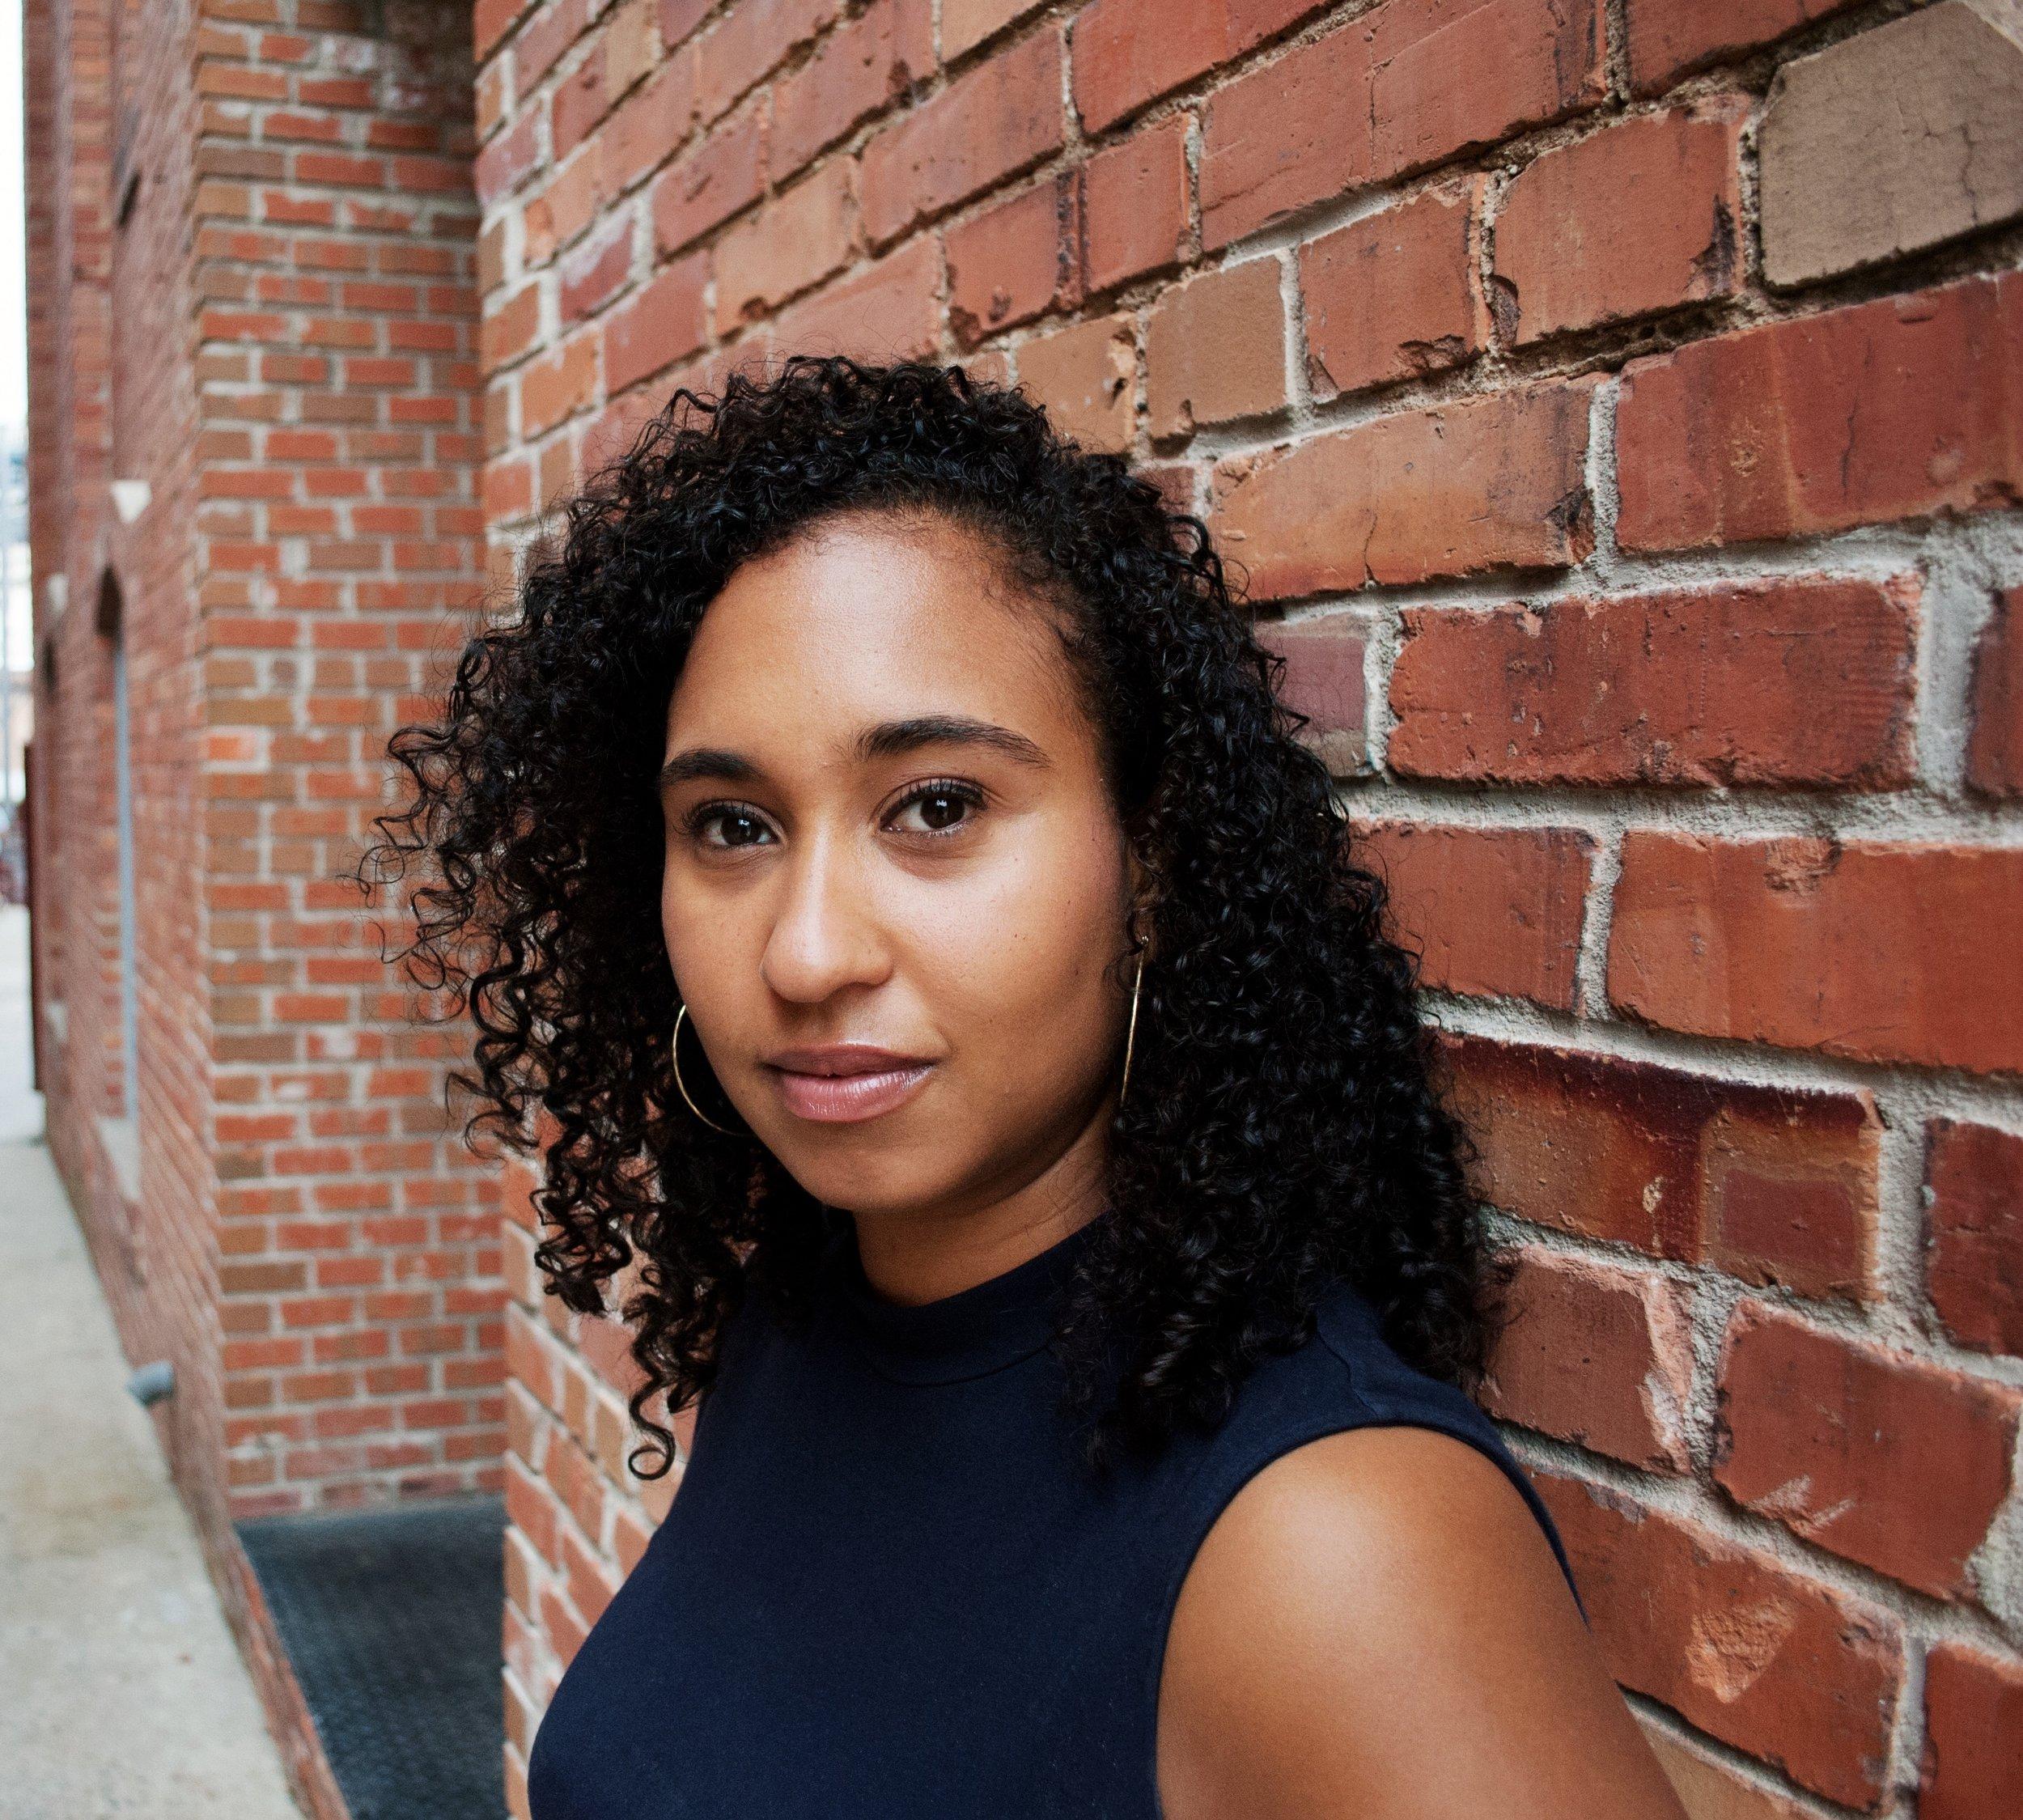 Naima Author 2017 - Naima Coster.JPG